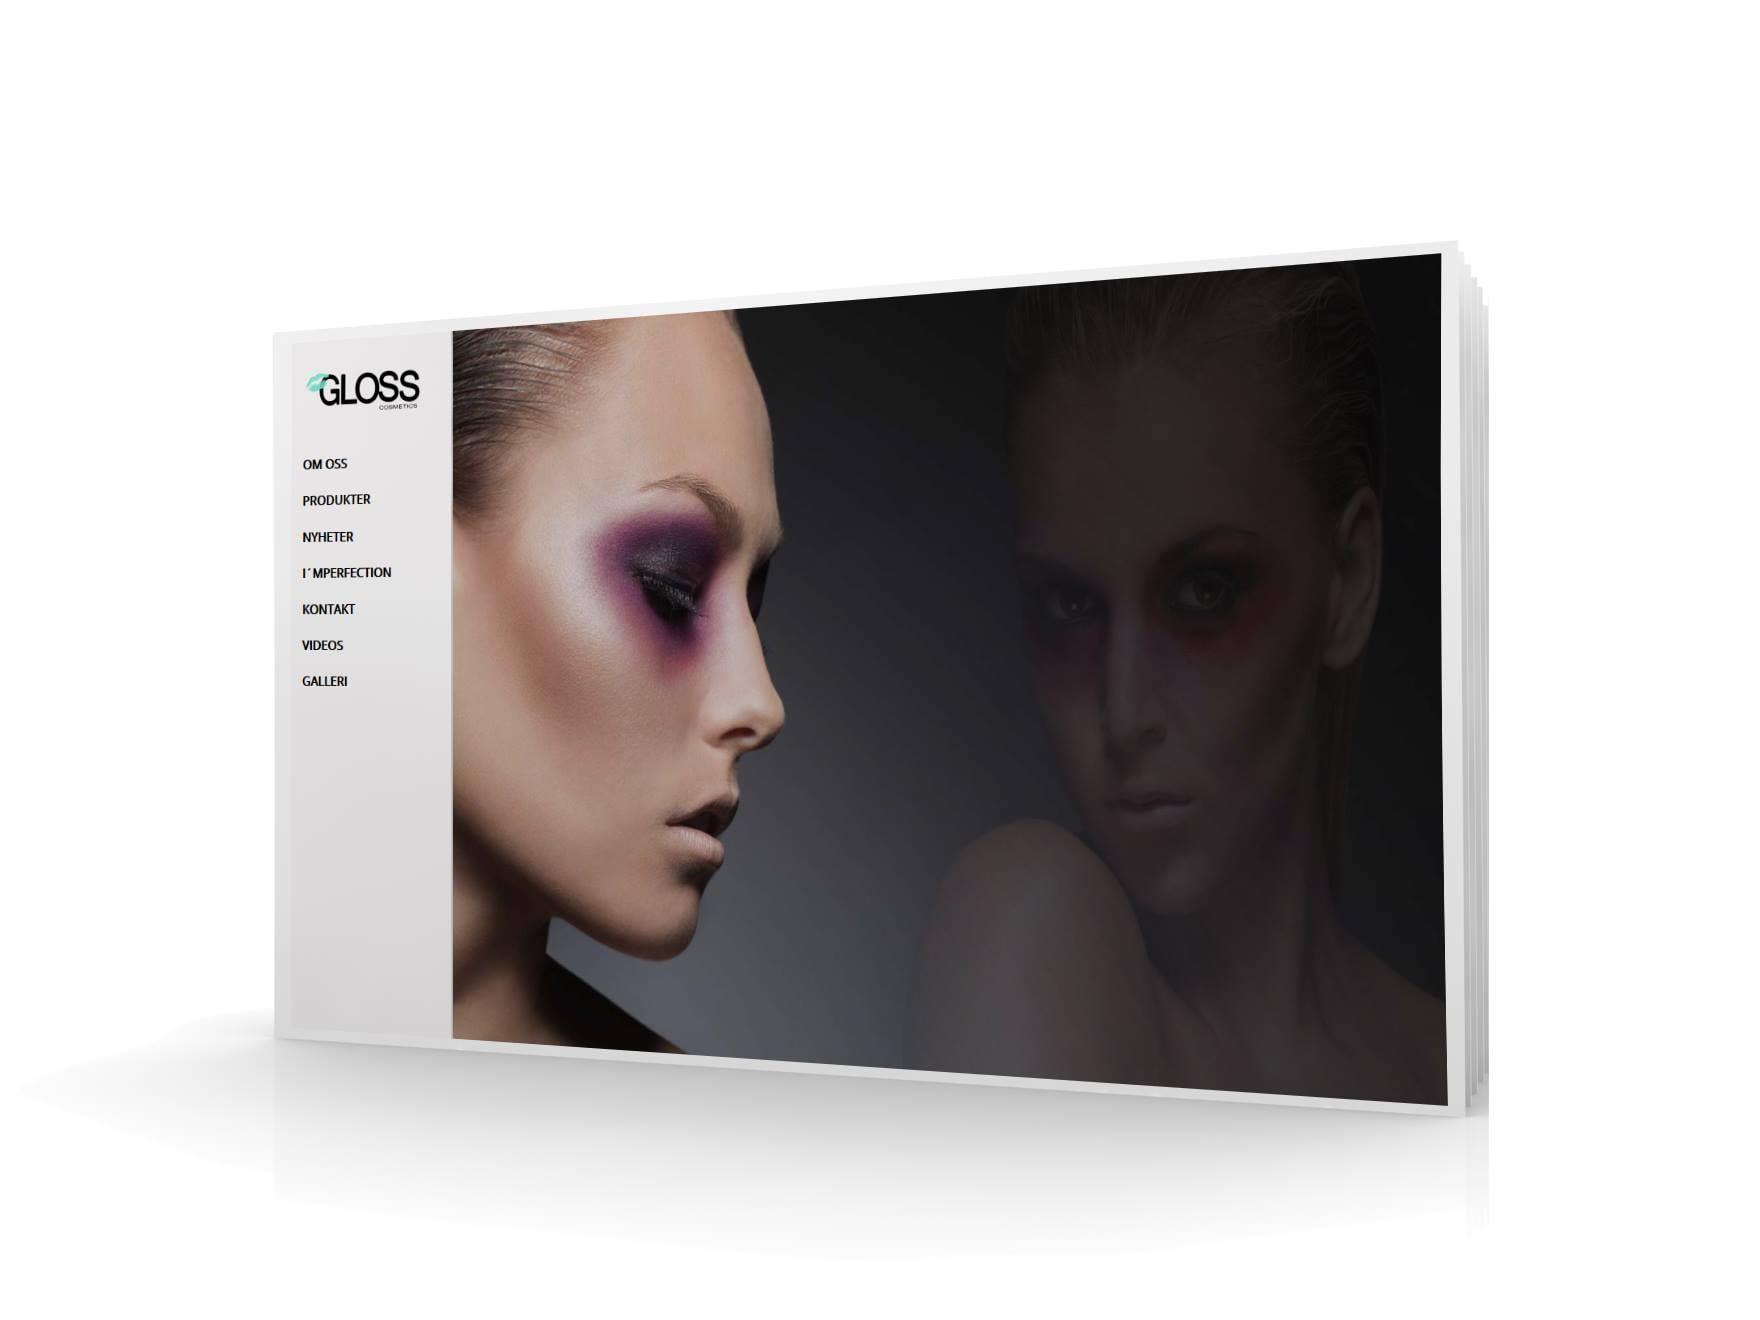 Gloss Cosmetics